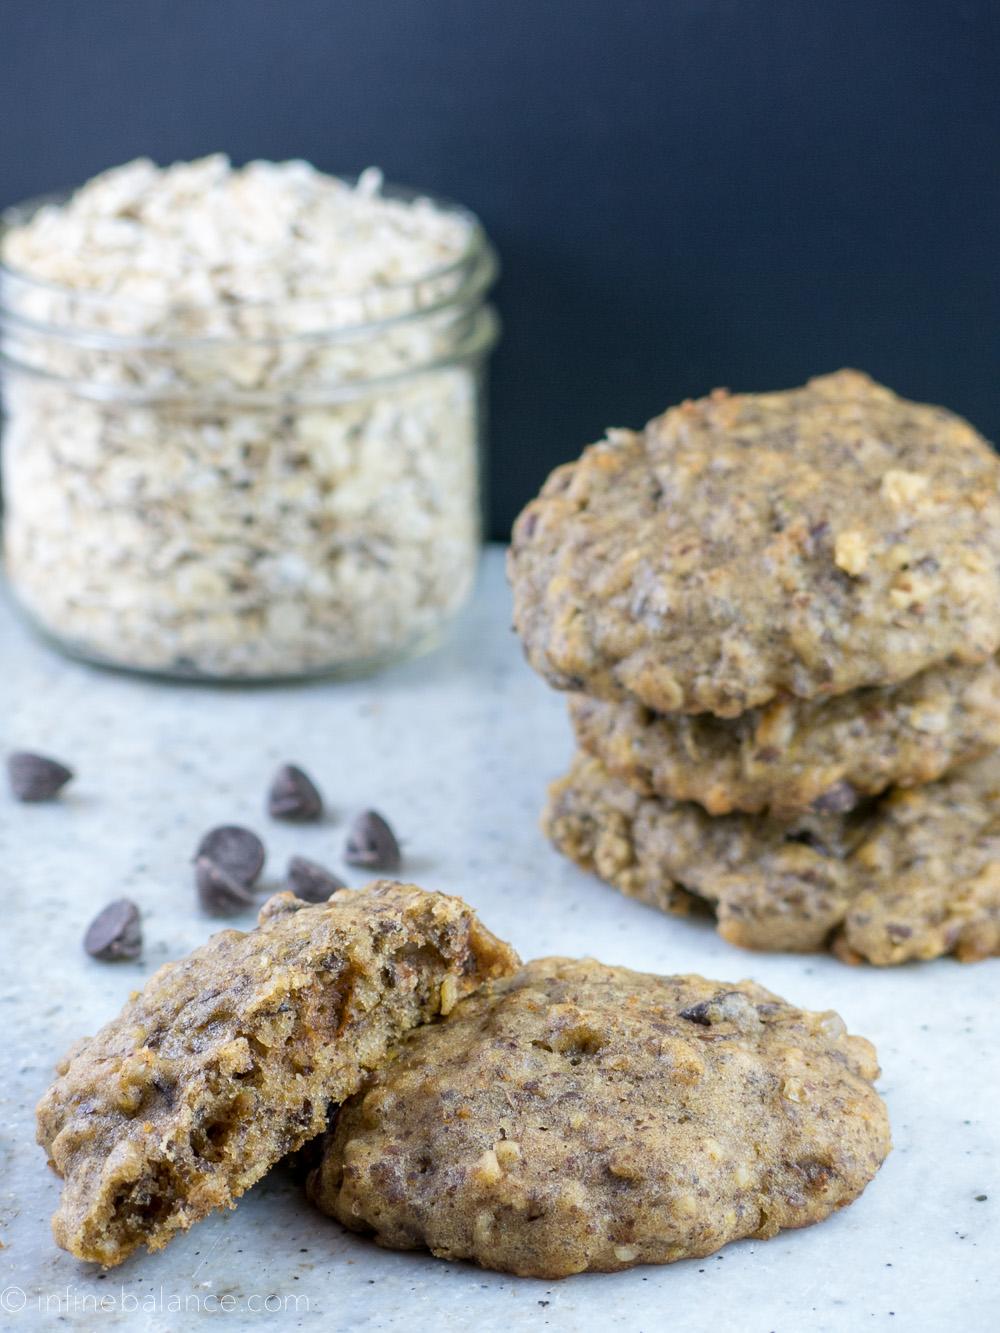 Chocolate Chip Flax Seed Cookies